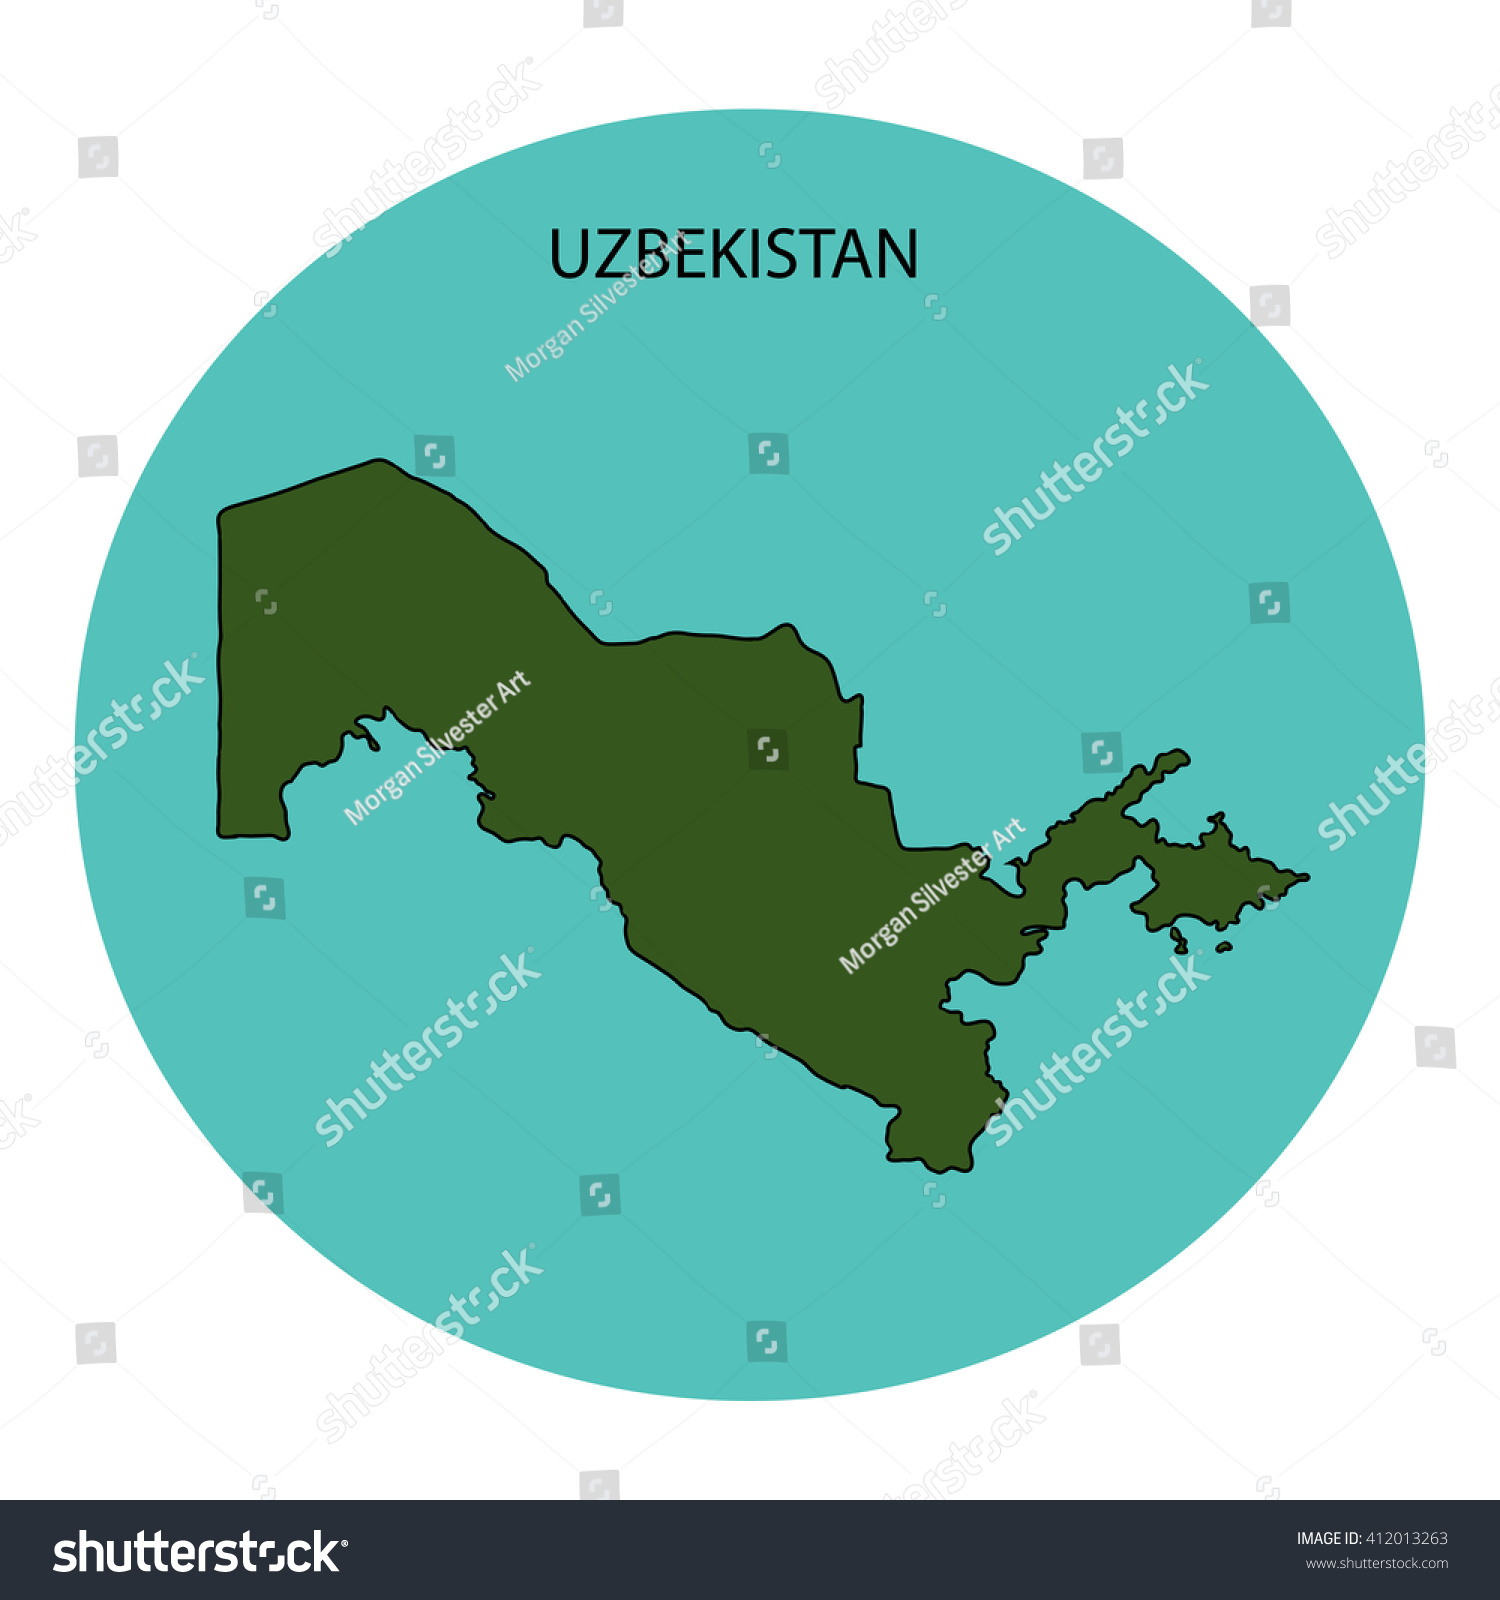 Uzbekistan Map Stock Illustration Shutterstock - Uzbekistan map